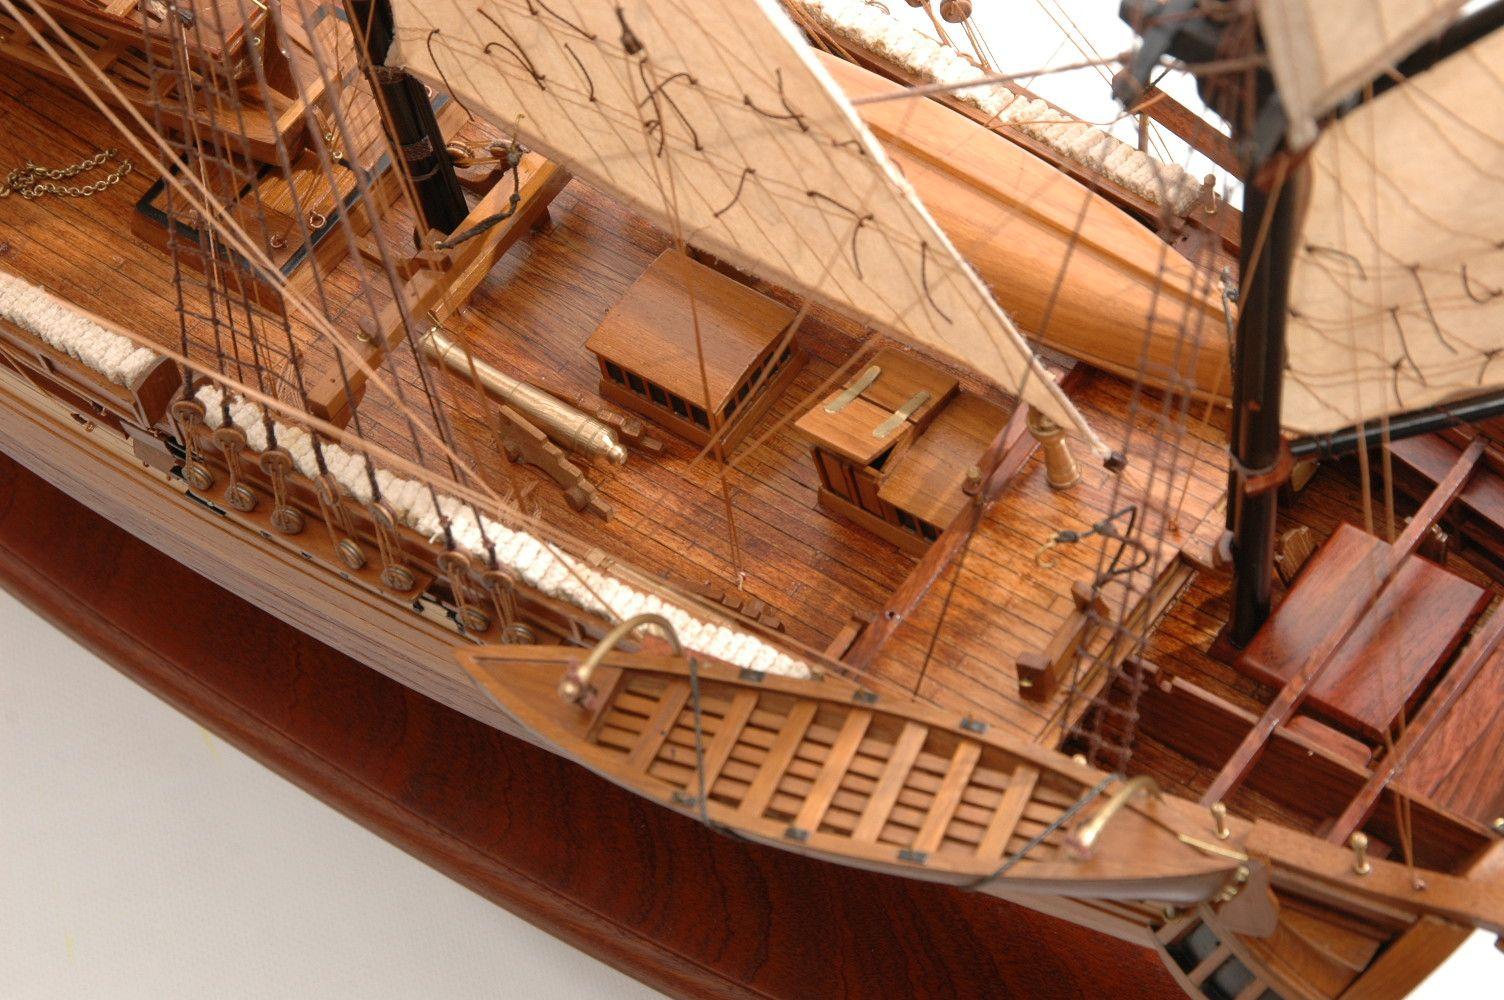 596-7314-HMS-Beagle-Model-Ship-Premier-Range